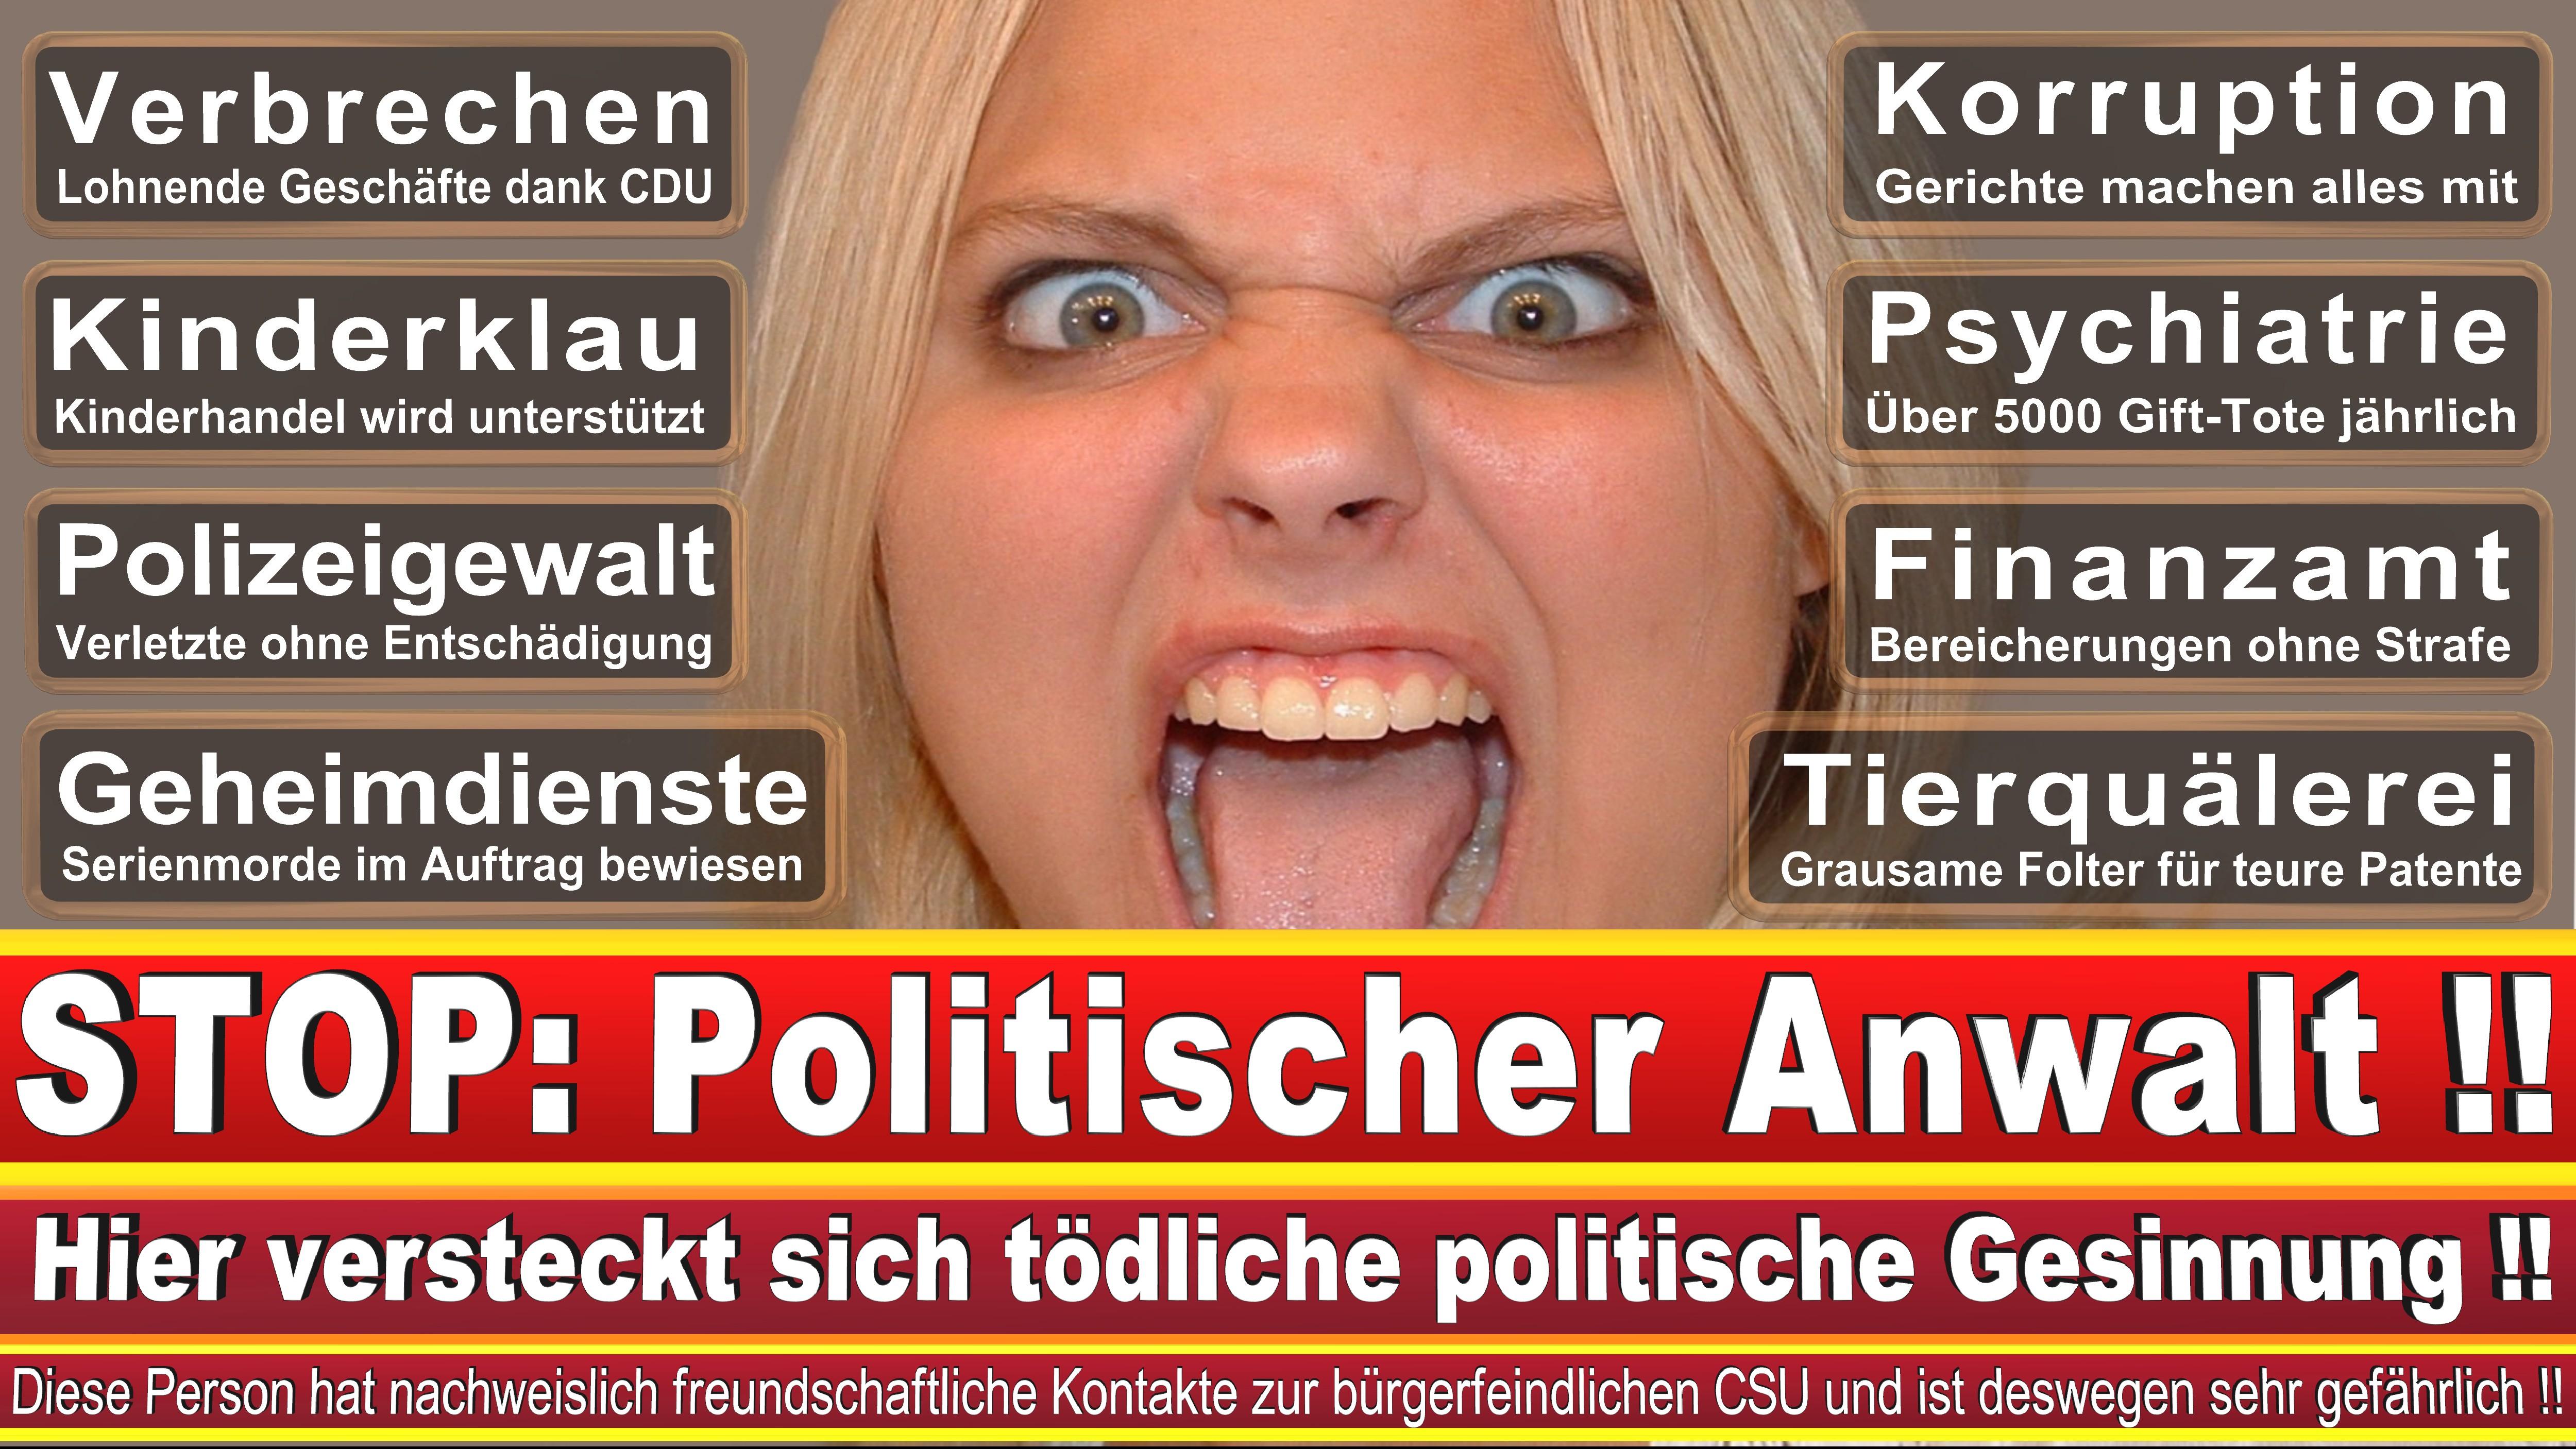 Rechtsanwalt Phillip C Campbell Partner München Steuerberater Rechtsanwalt Jahresabschlüsse Vereine Erbschaftsteuer 1